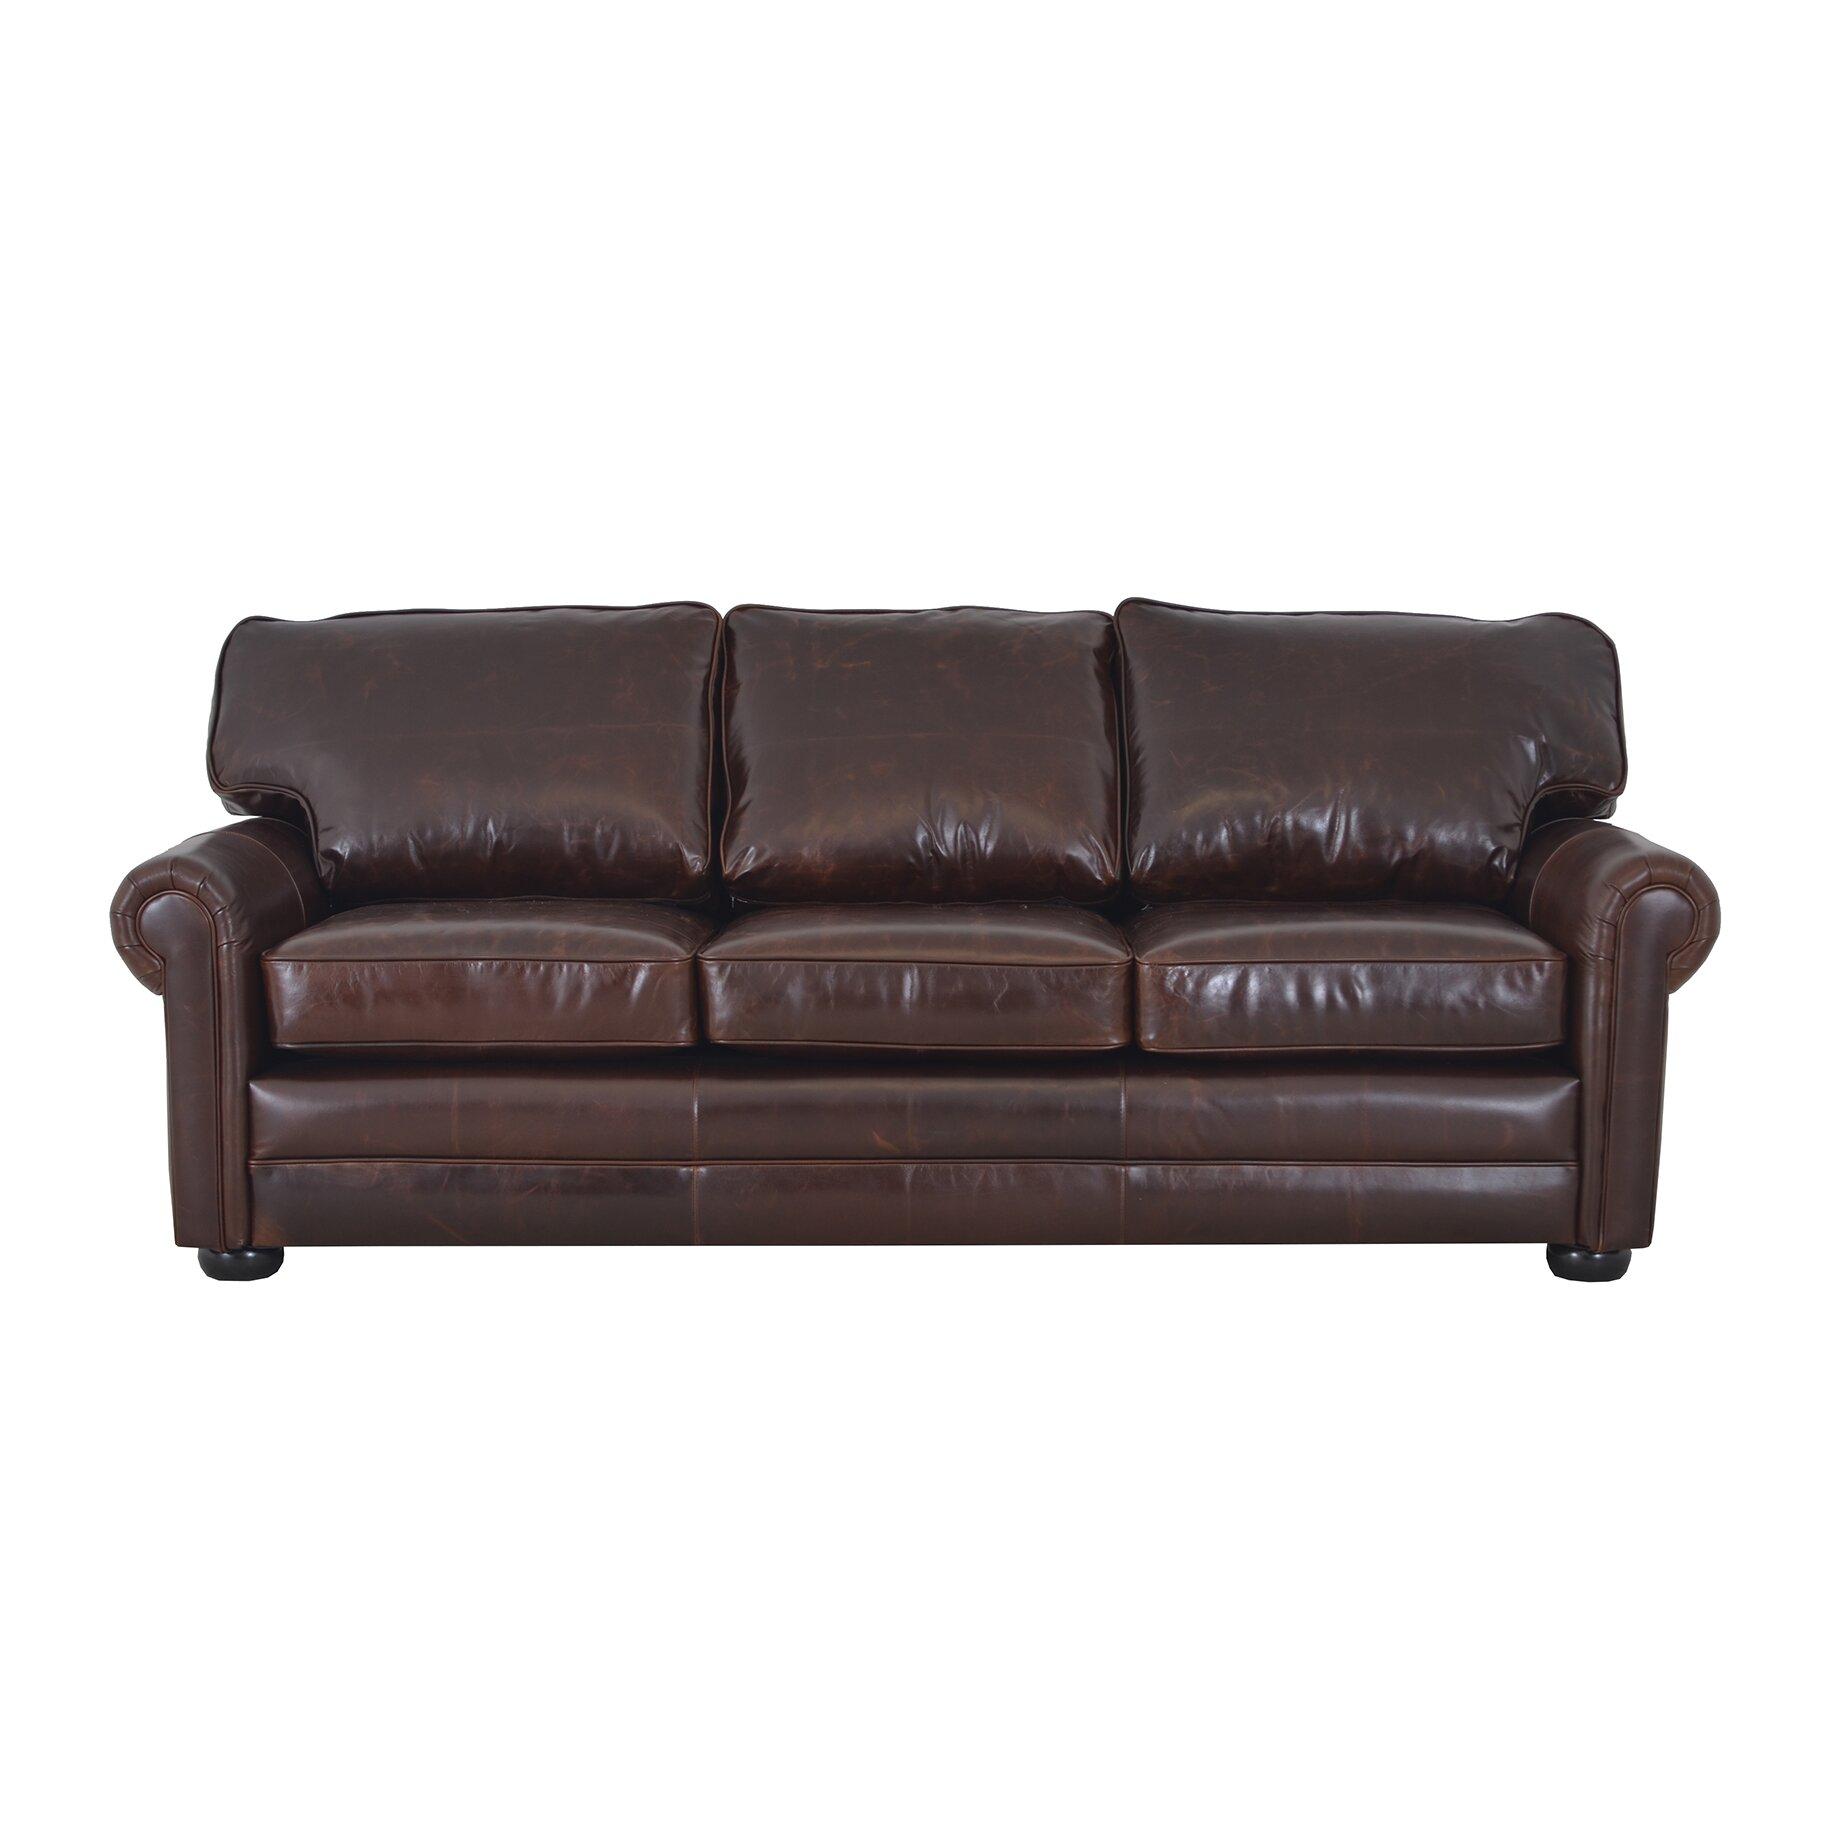 Best Genuine Leather Sectional Sofa: Westland And Birch Fenway Studio Genuine Top Grain Leather